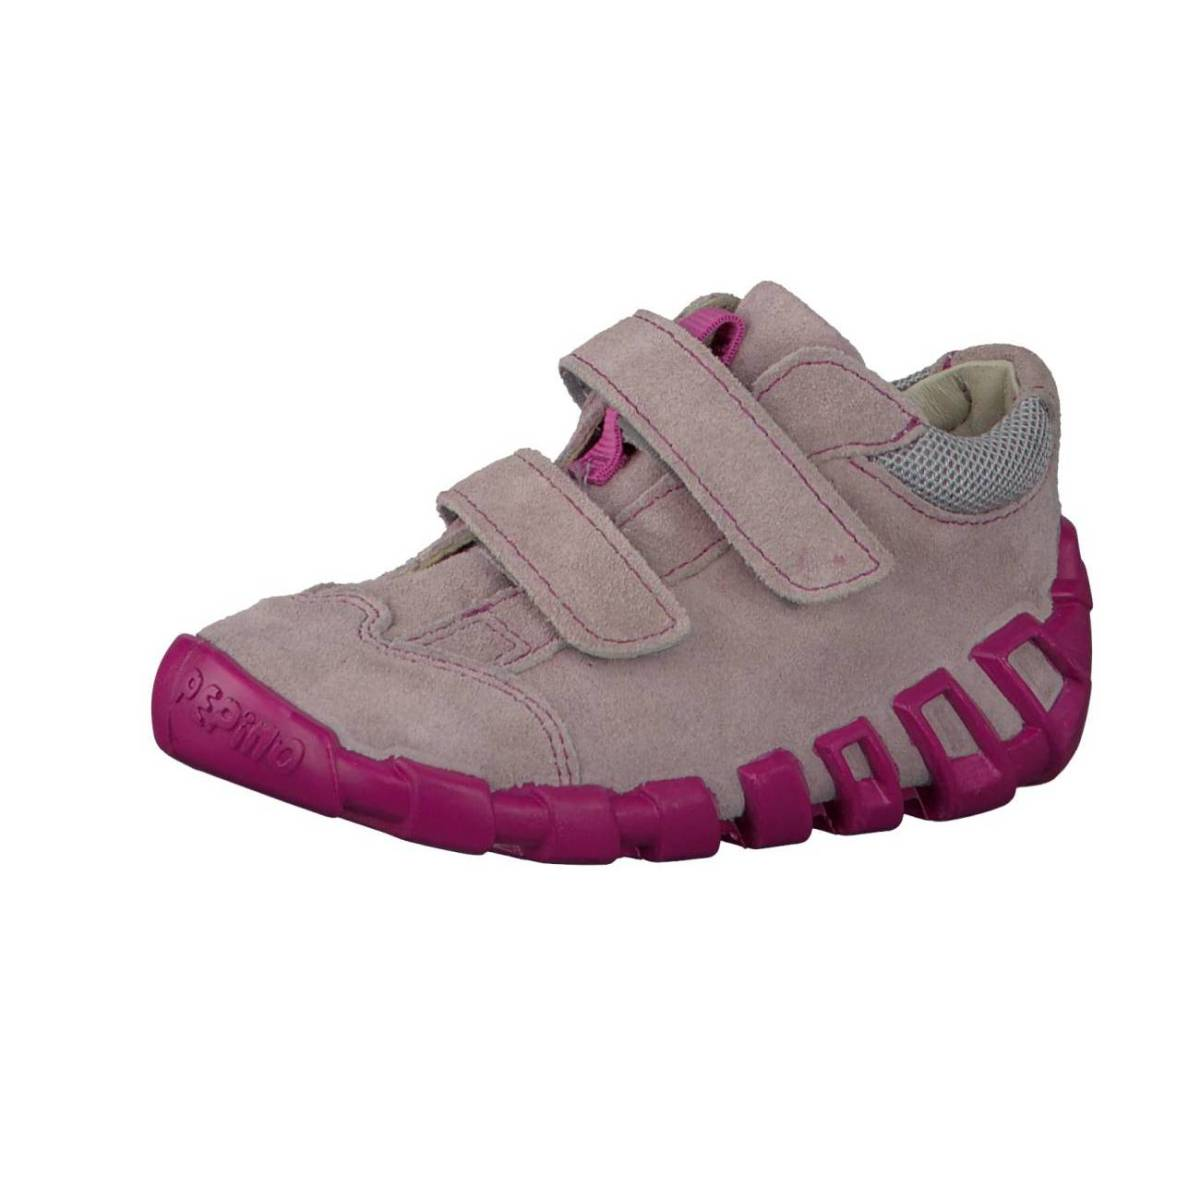 Ricosta Pepino Asky grau lila graphit Lauflernschuhe Sneaker Jungen Mädchen